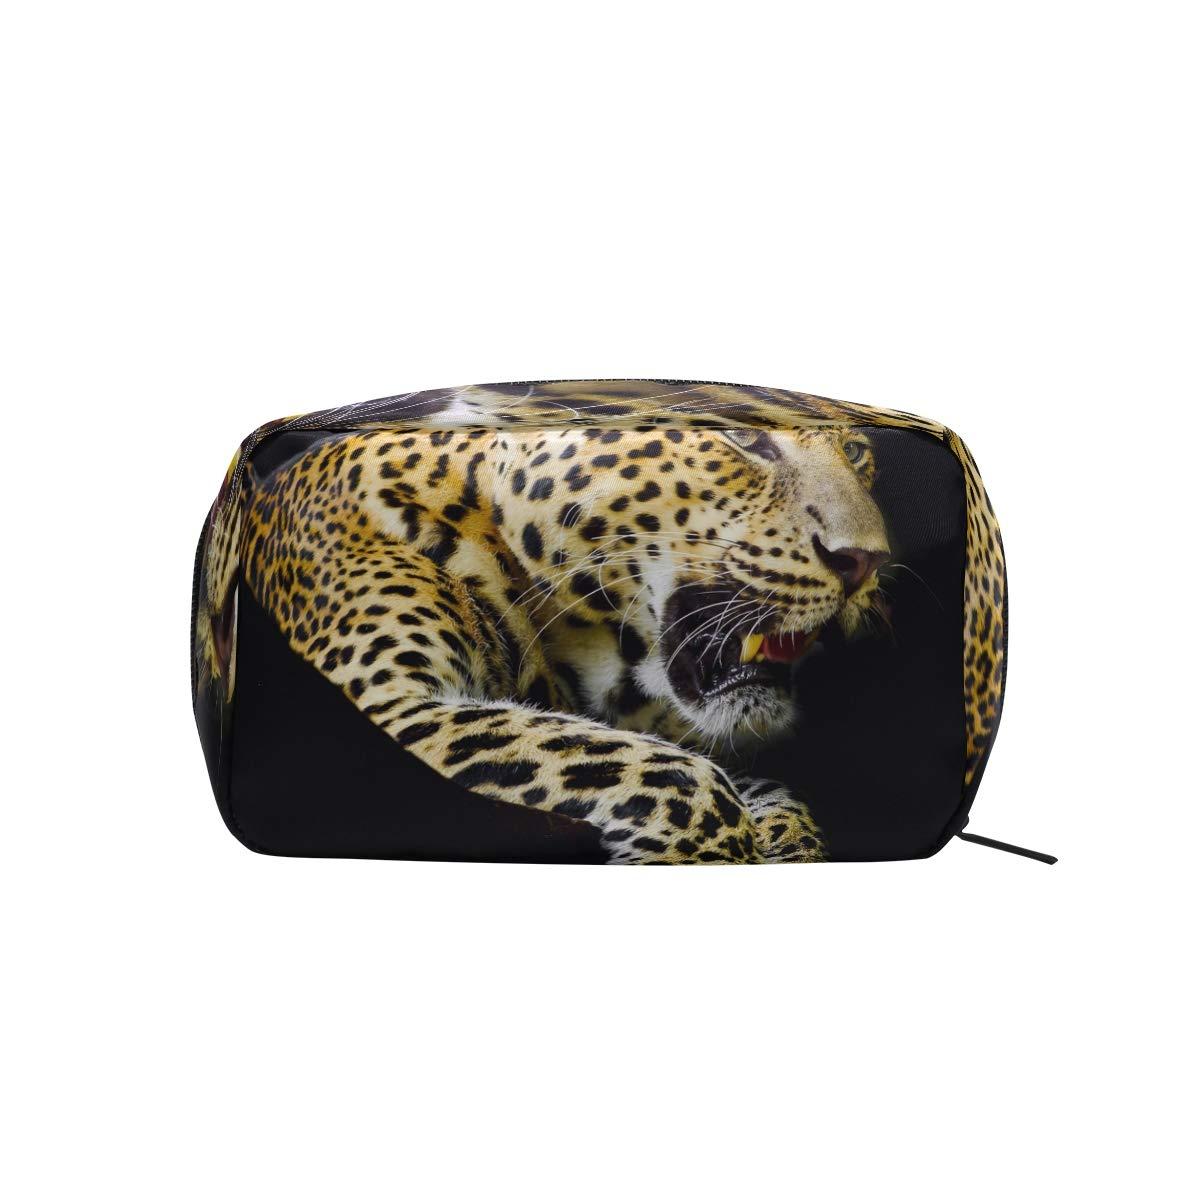 Leopard Pattern Print Makeup Case Cosmetic Bag